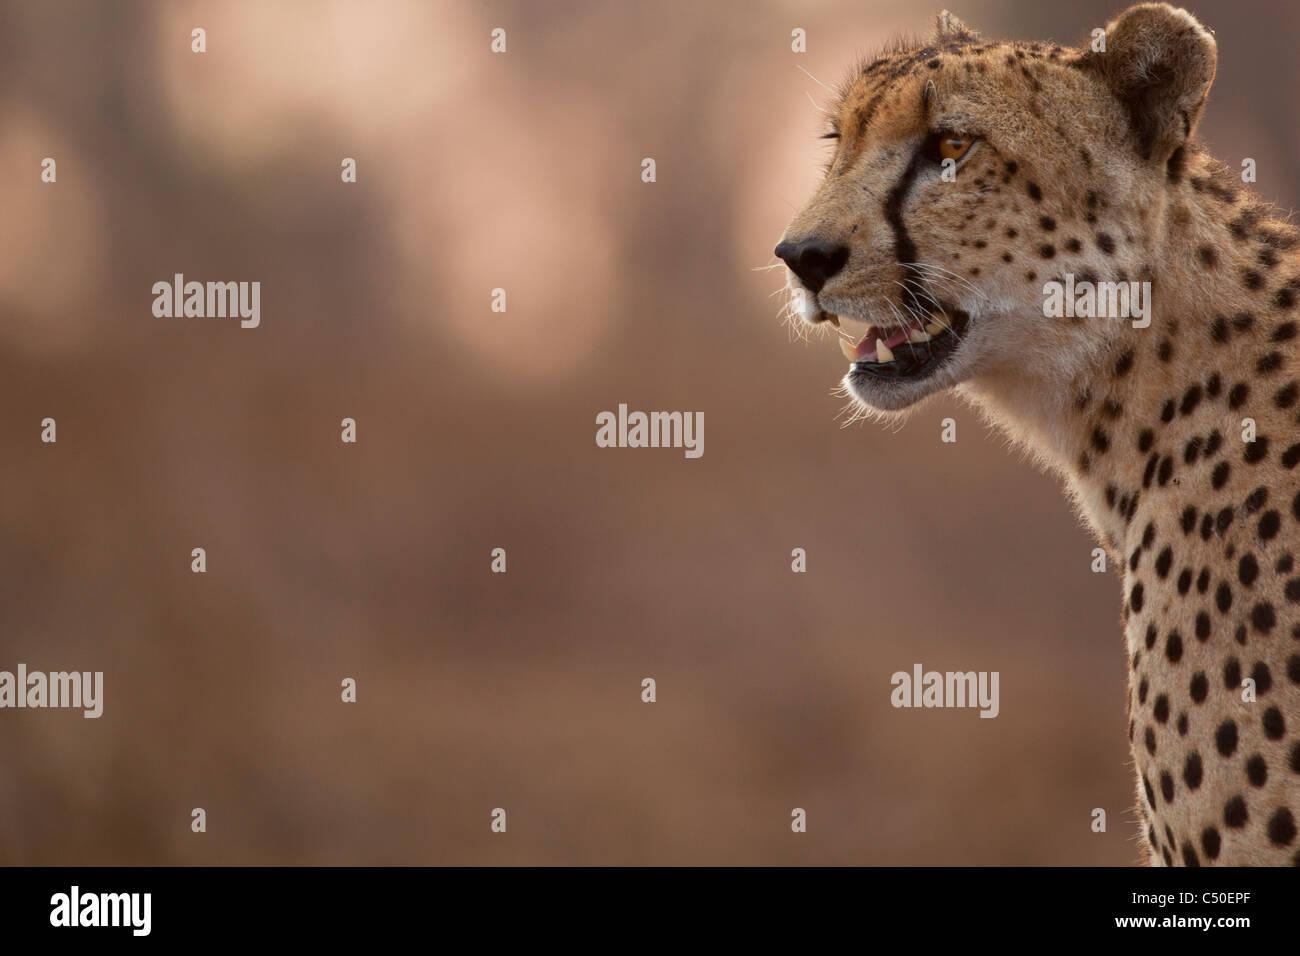 Gepard (Acinonyx Jubatus) Porträts am Orpen, Krüger Nationalpark, Südafrika Stockbild